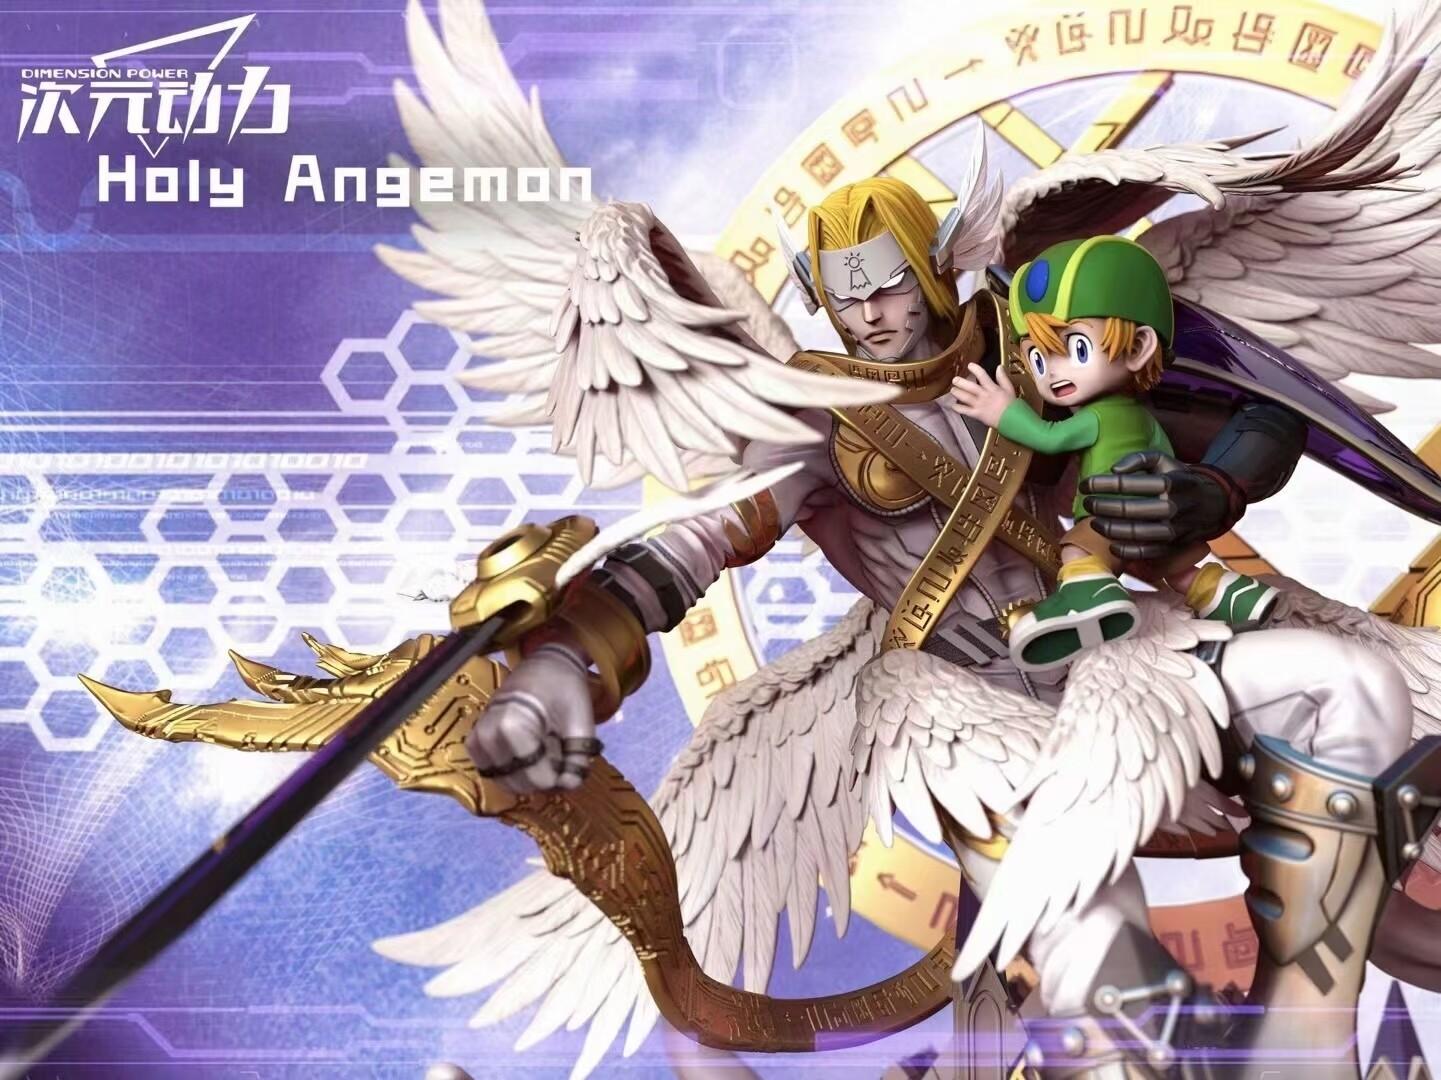 (PO) Dimension Power - Holy Angemon